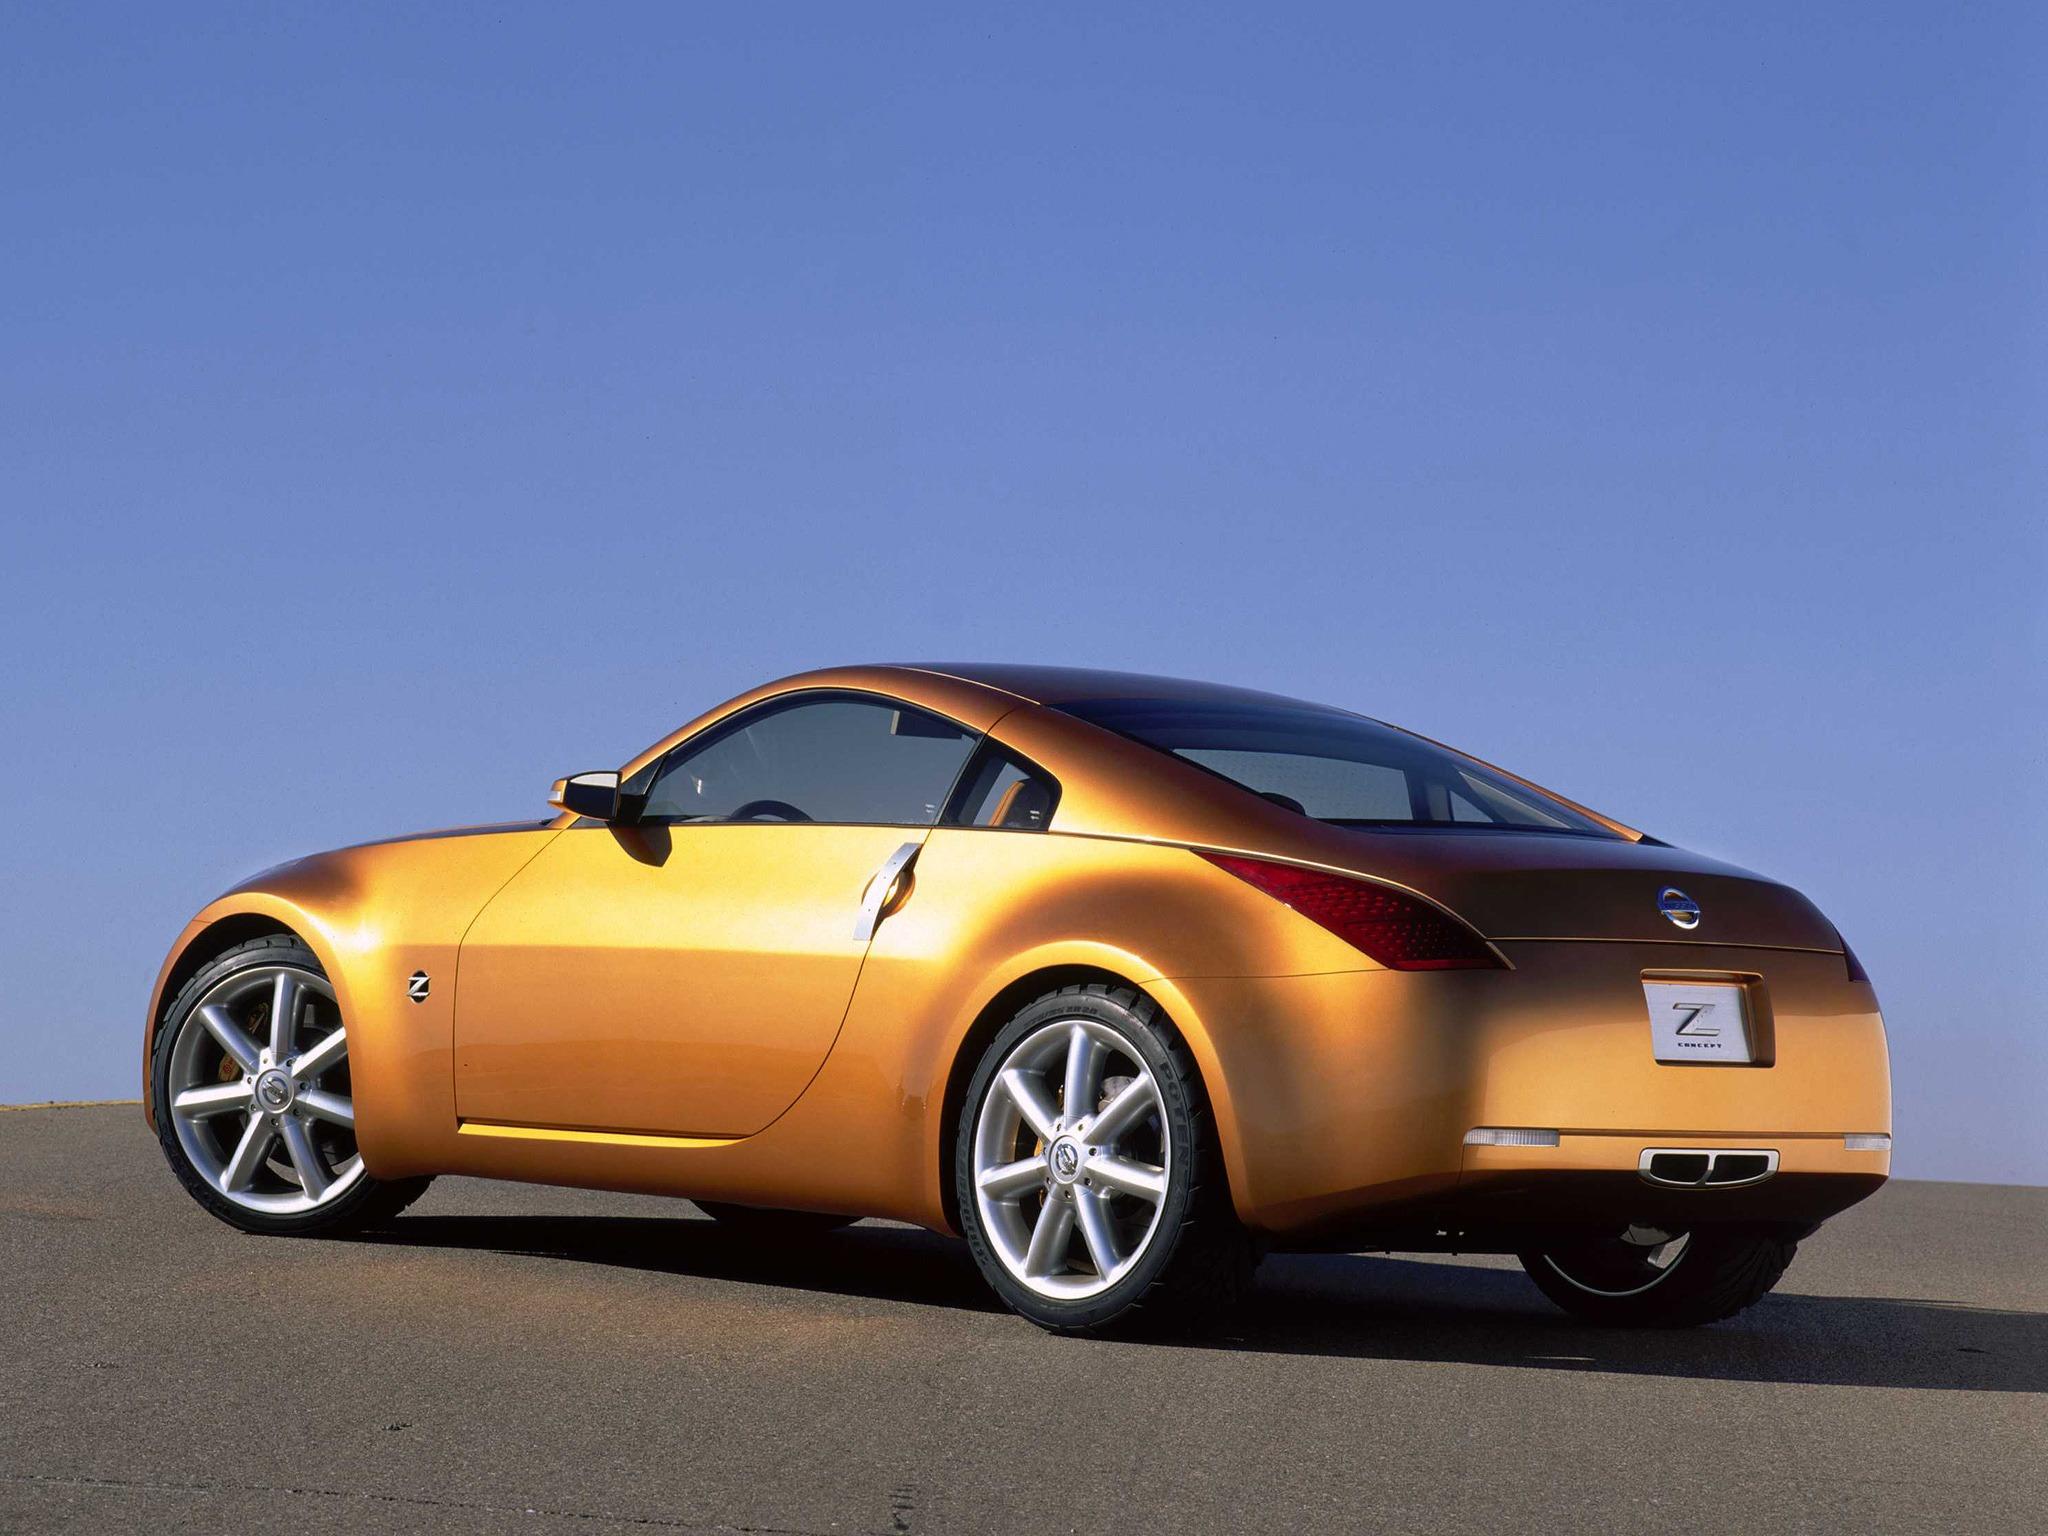 Nissan Z Concept 2001 Old Concept Cars